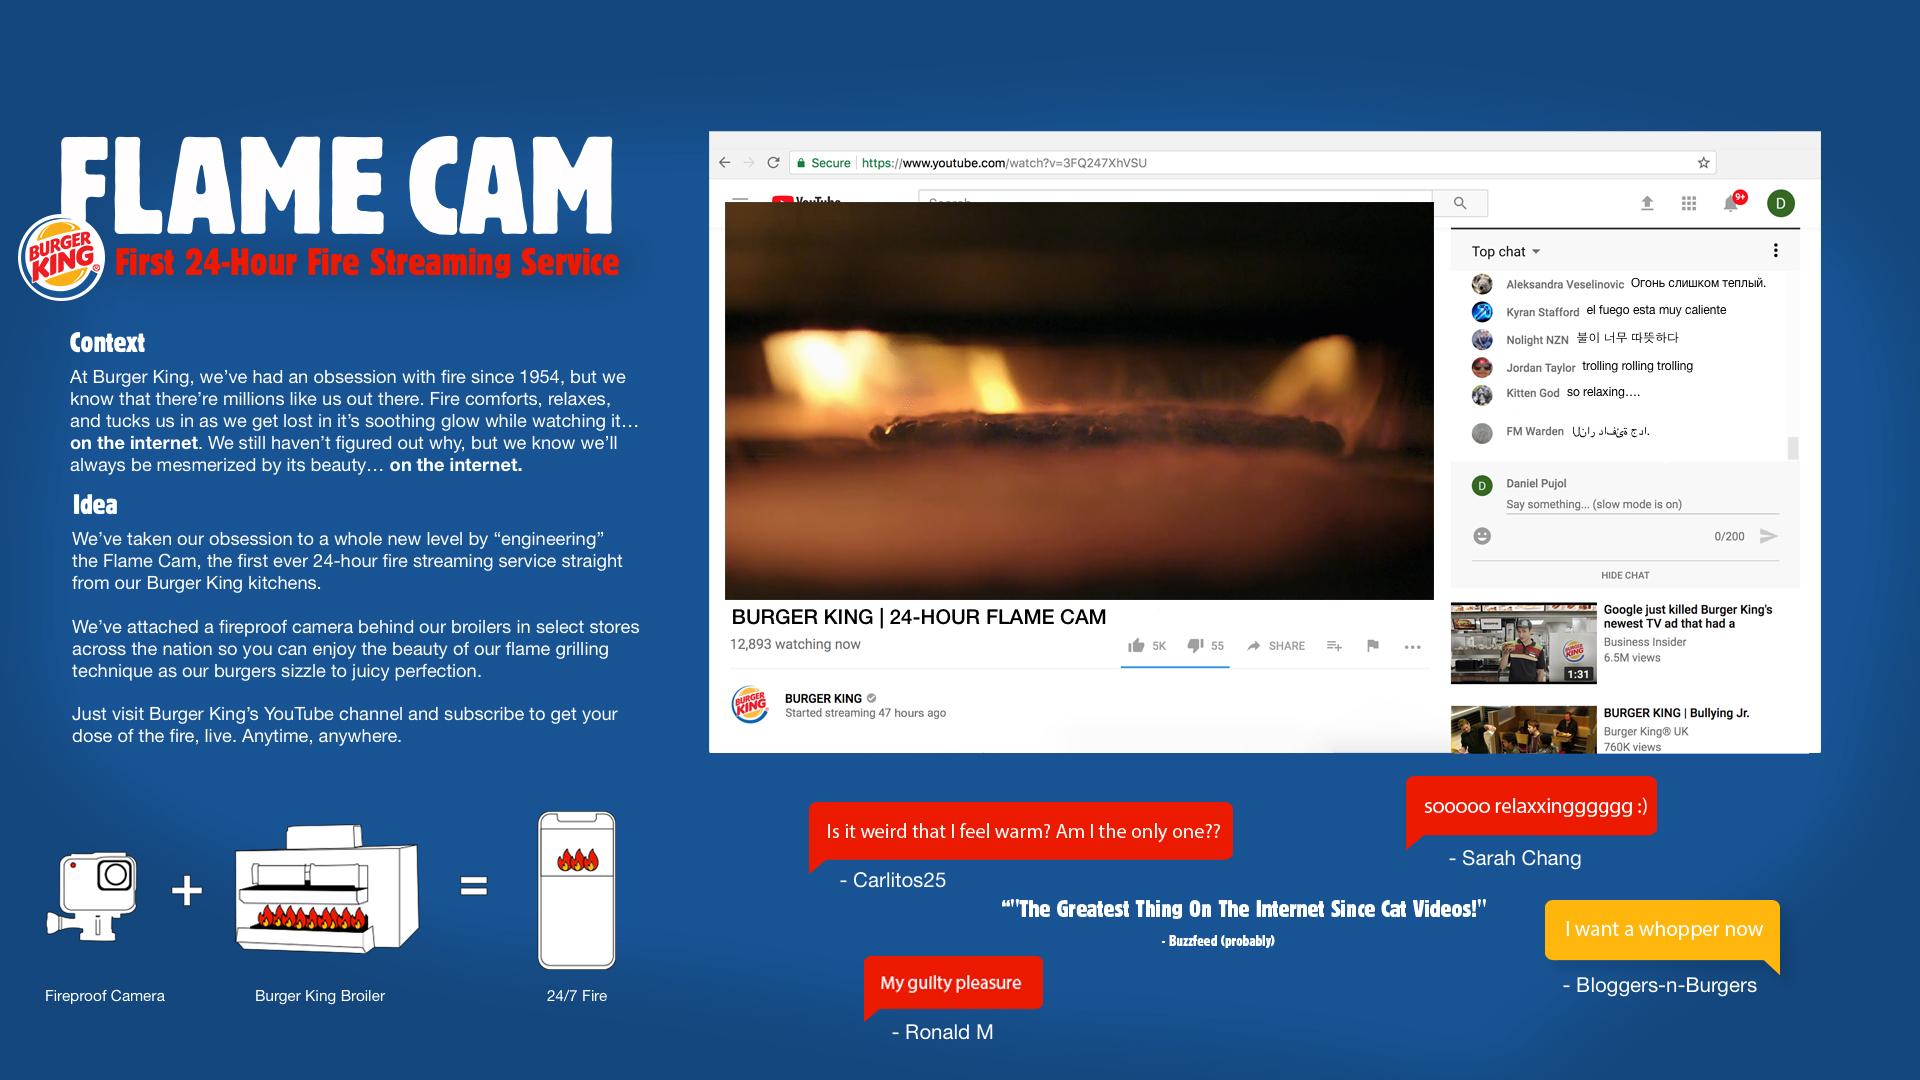 flamecamcaseboard-d&ad.jpg